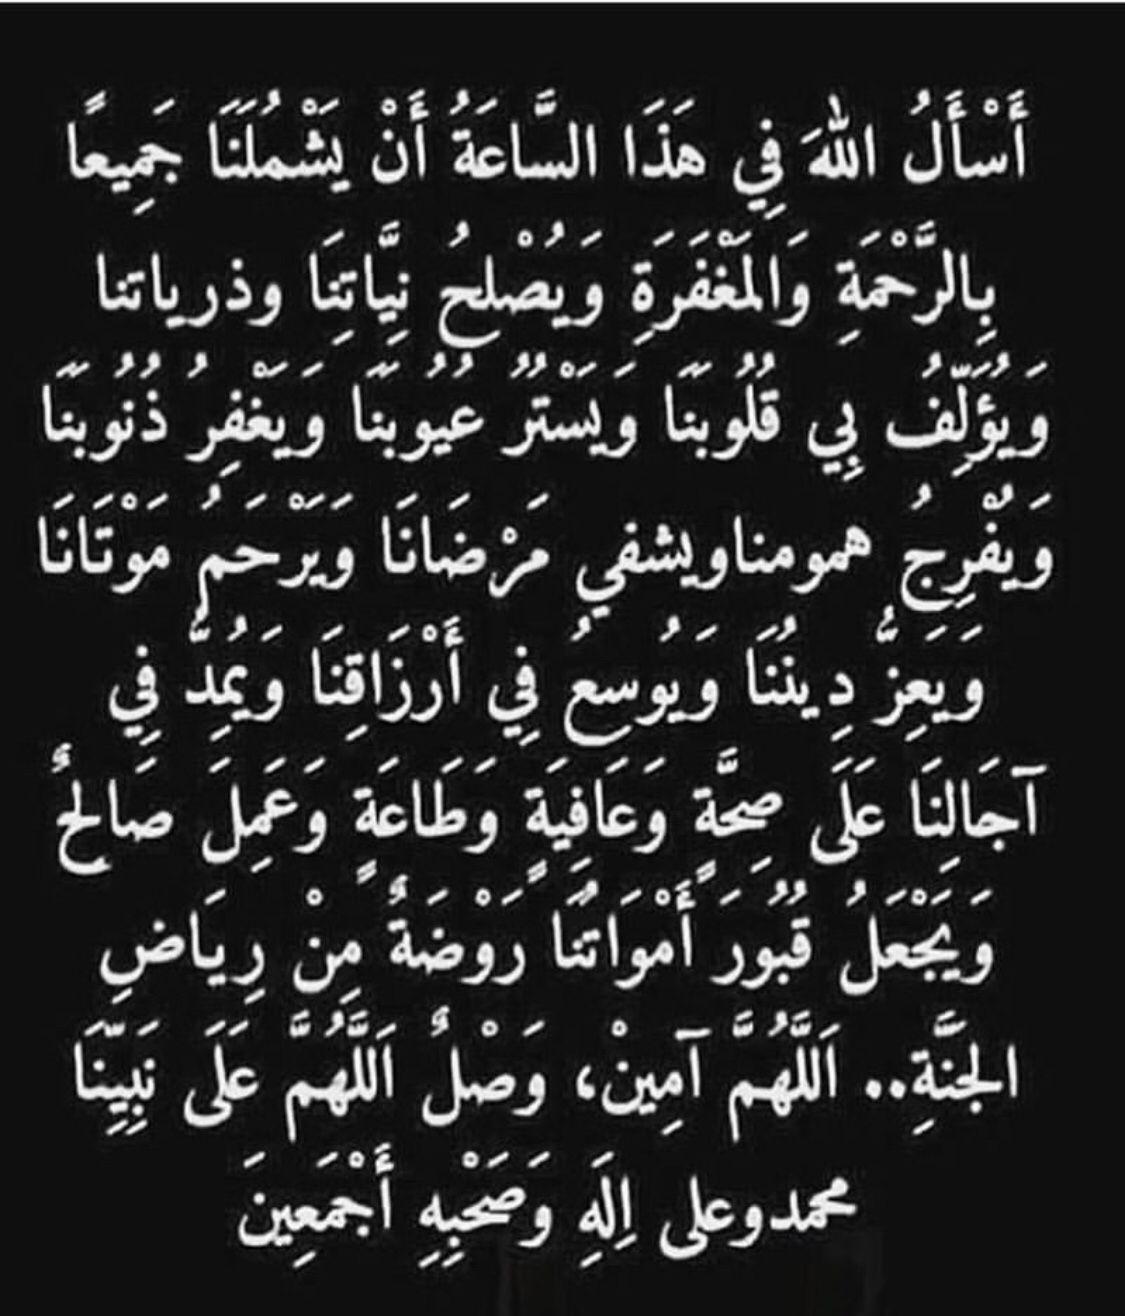 Pin By Jamila Ali On Osama Morning Prayer Quotes Islamic Love Quotes Ramadan Quotes